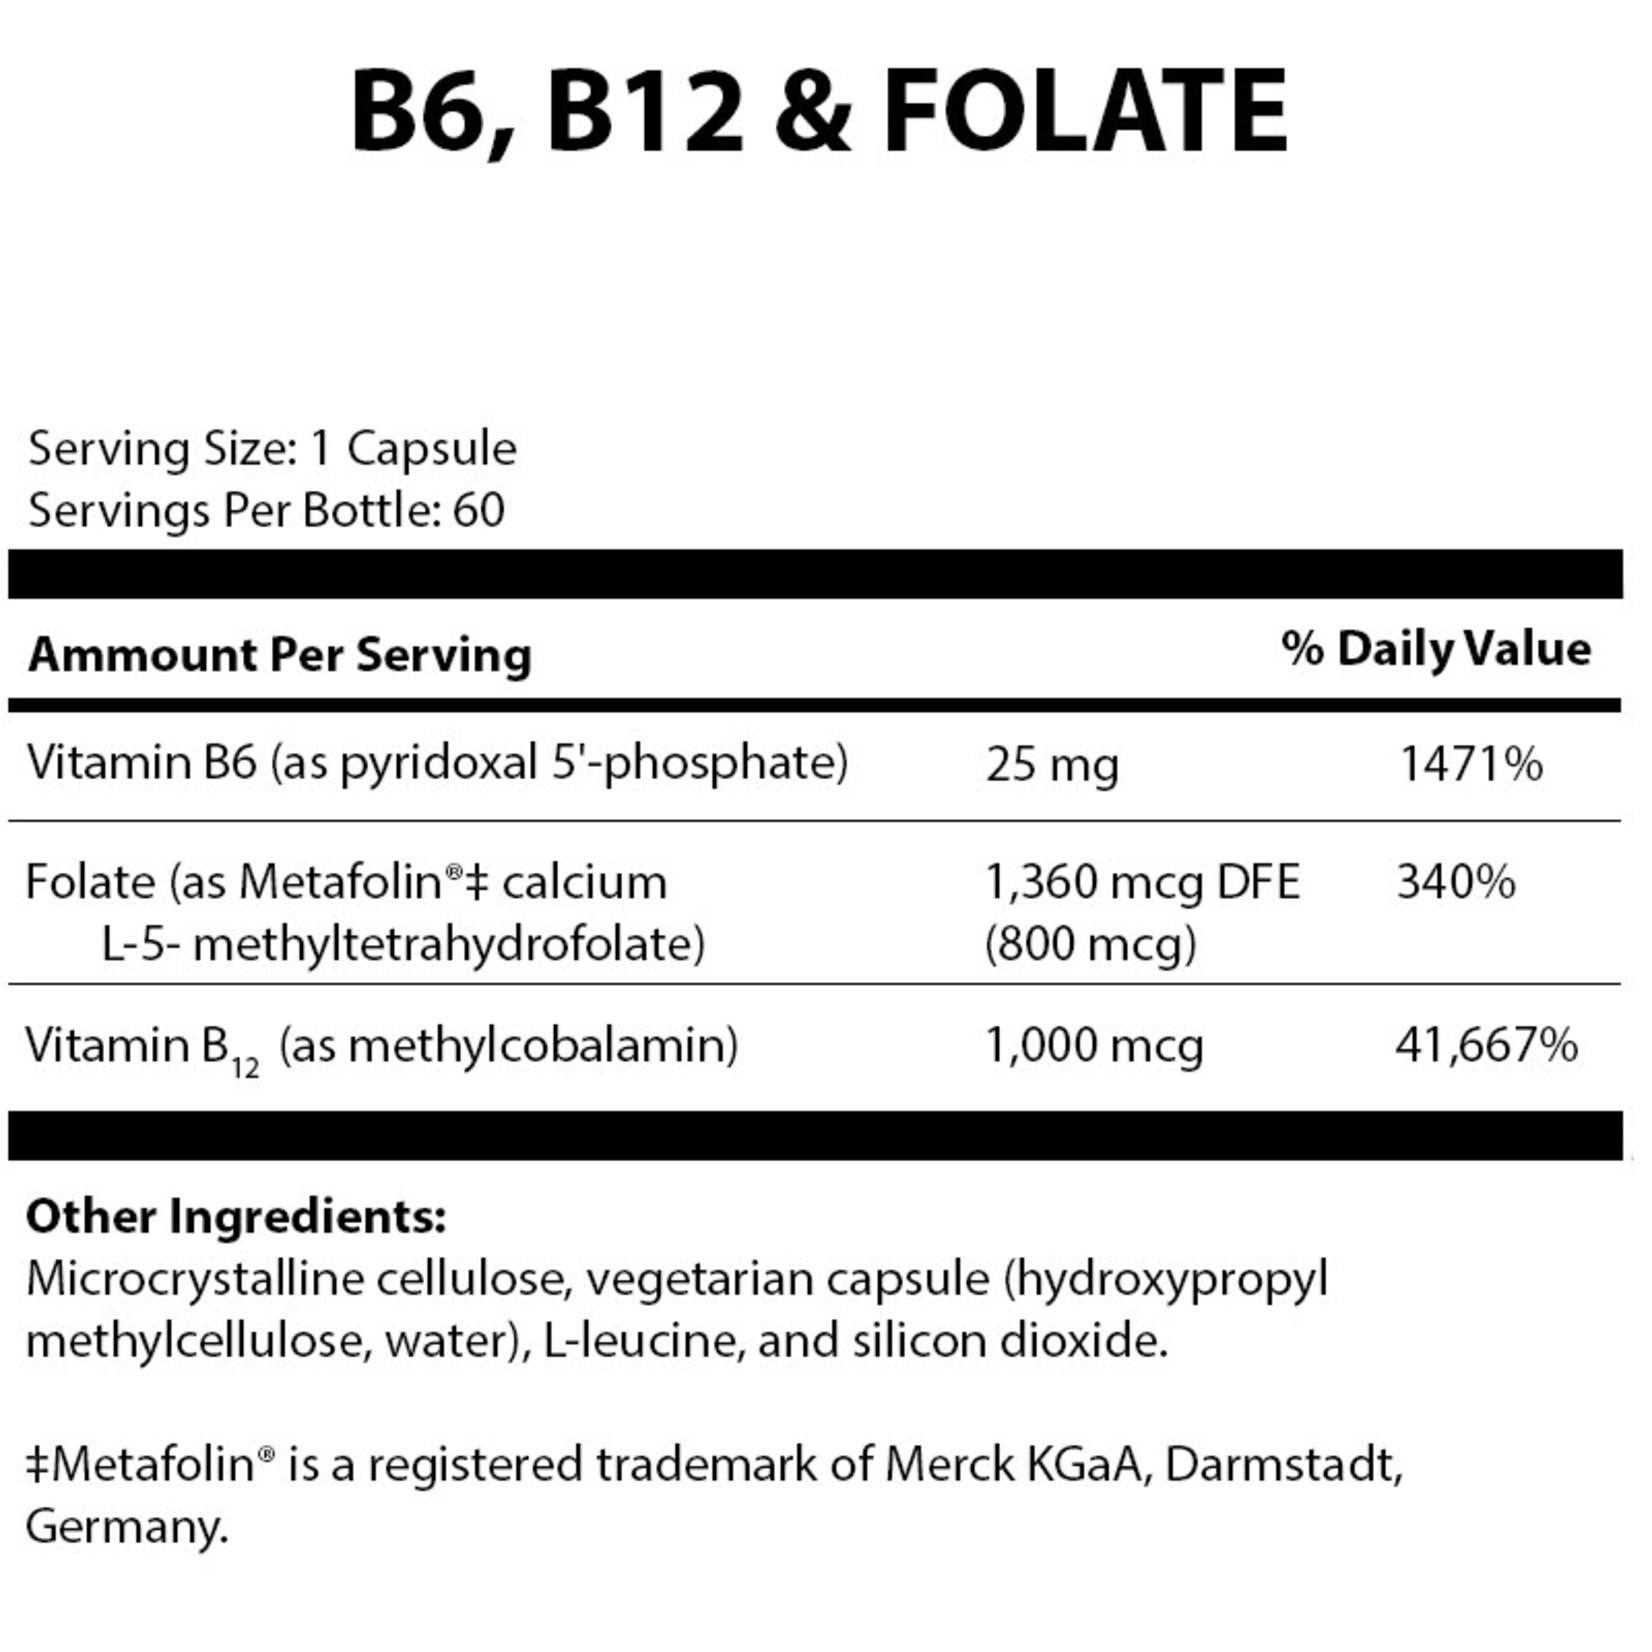 Alpine Clinic PL B6, B12 and Folate